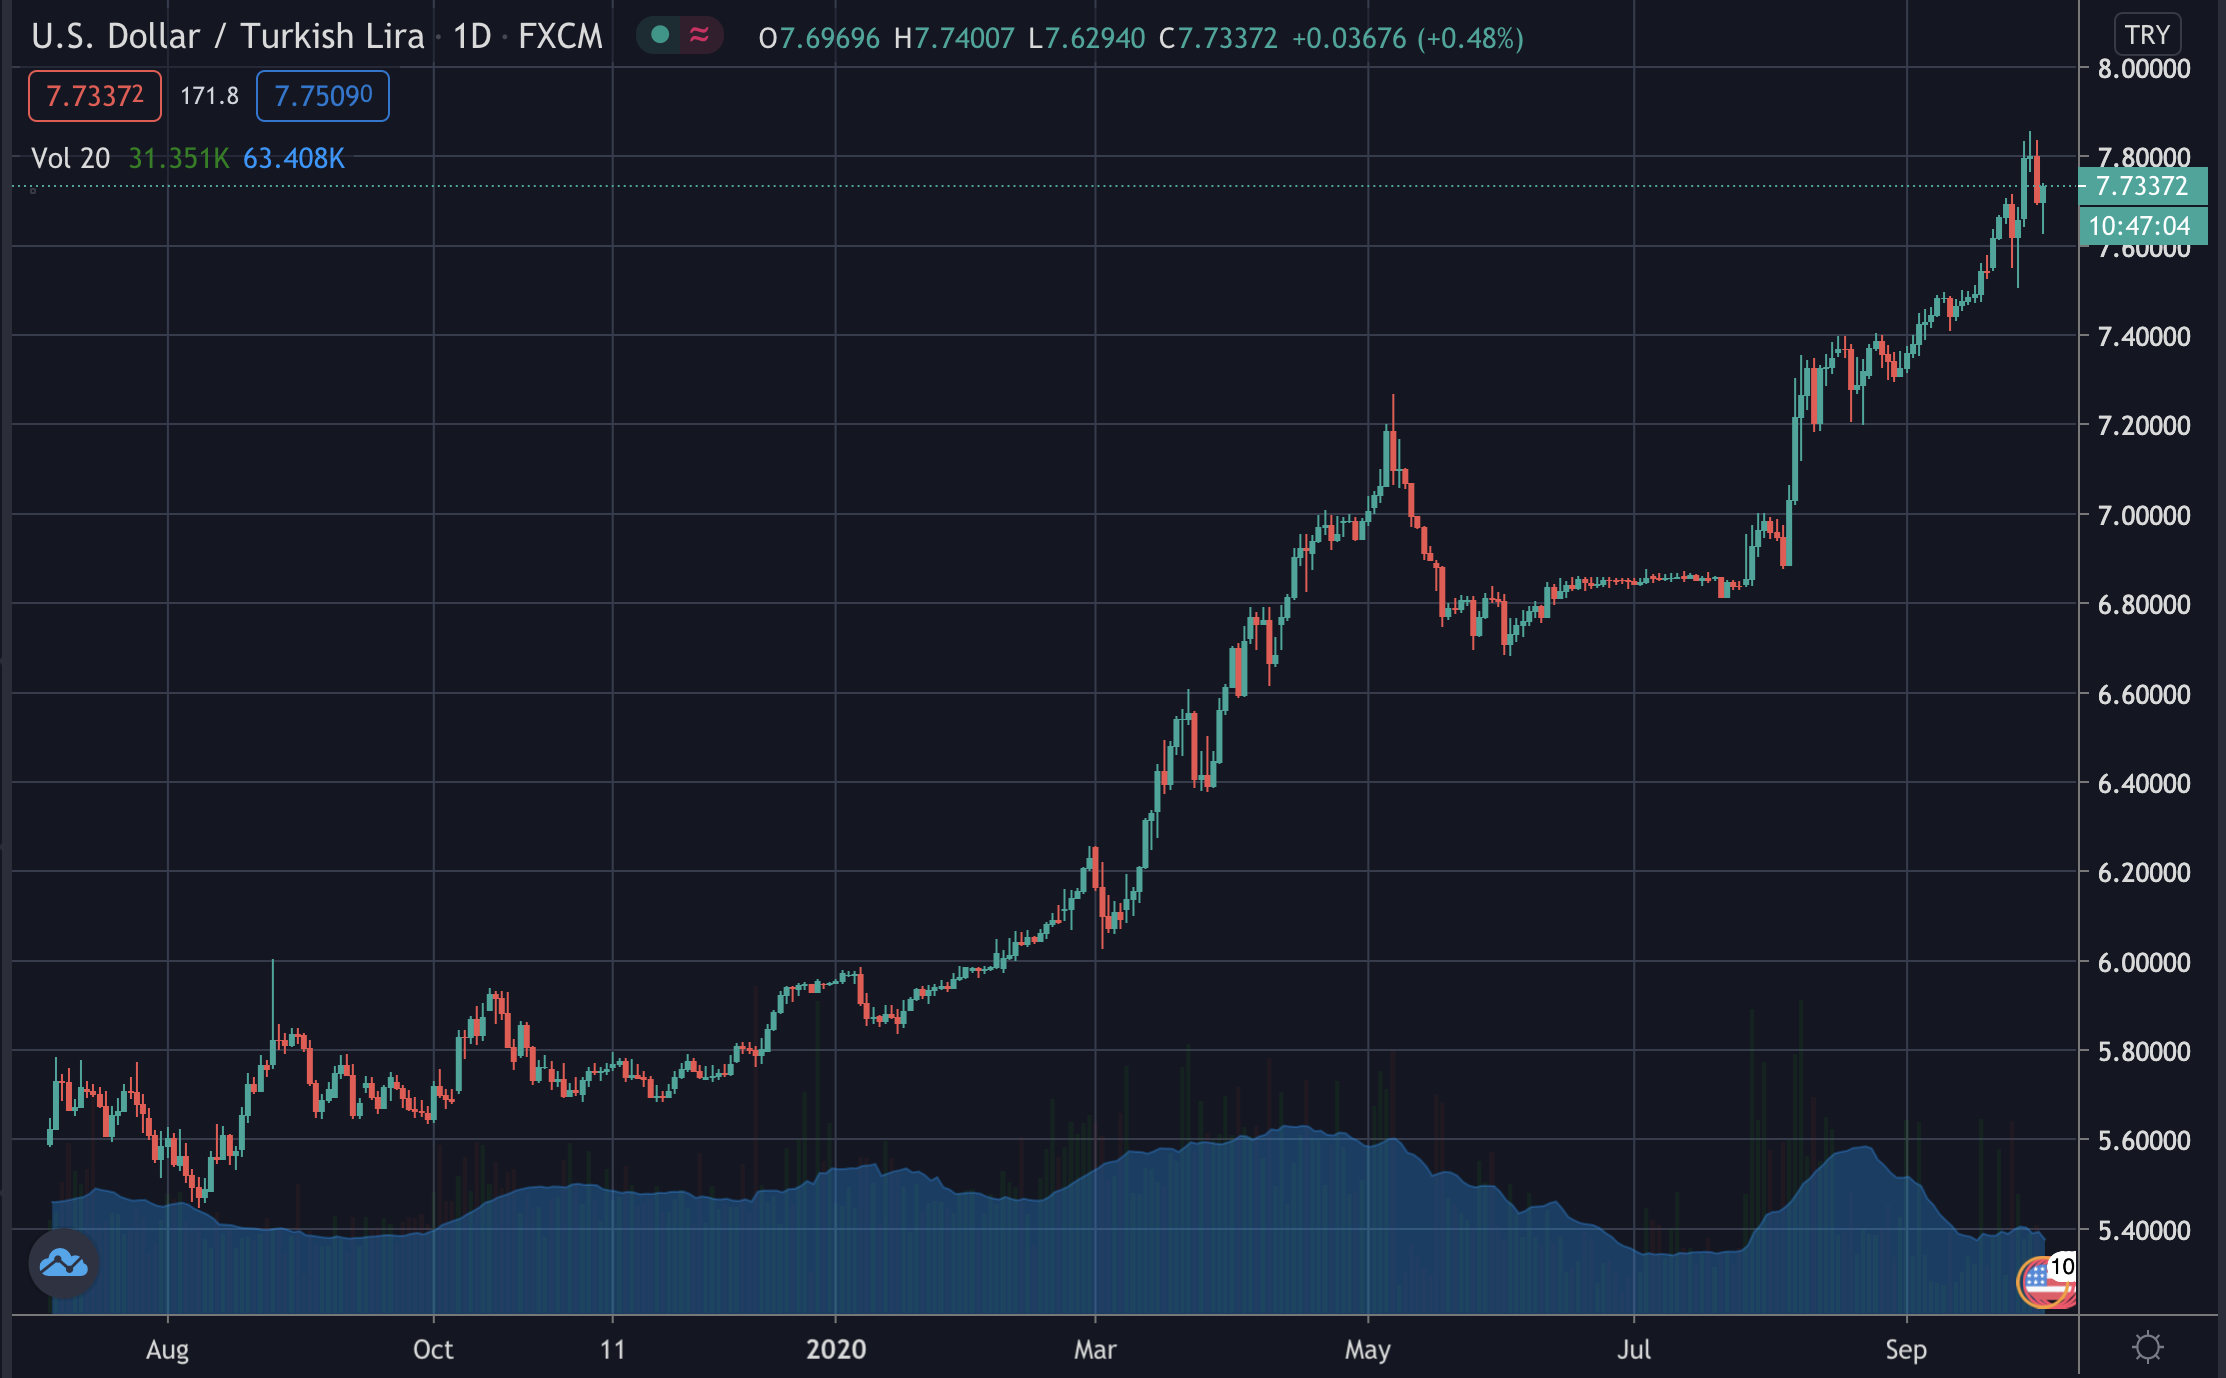 USD/TRY, October 2020